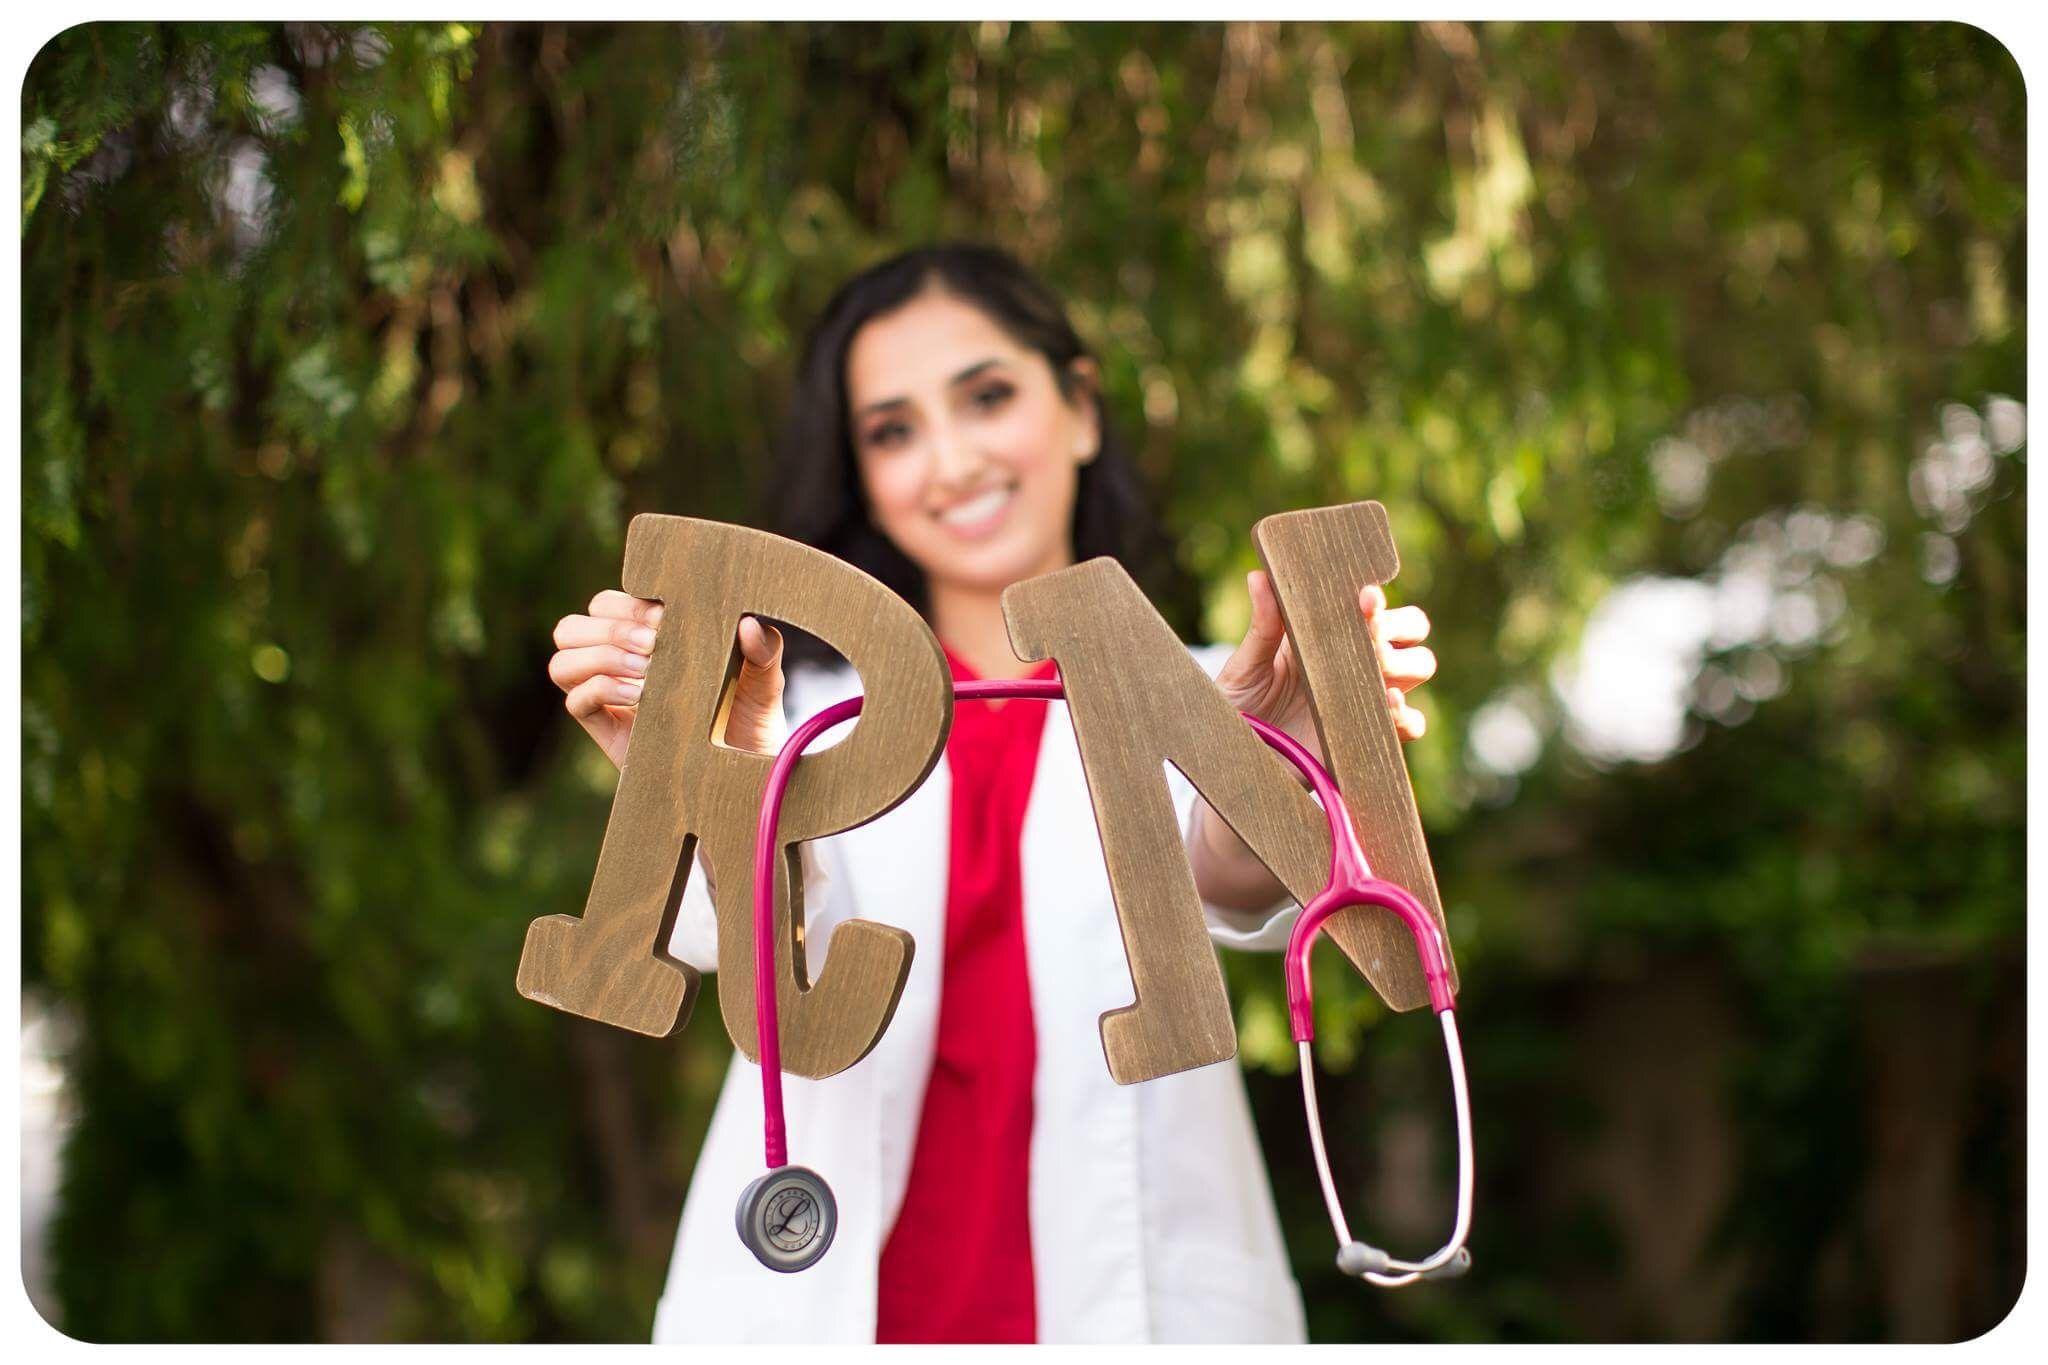 Graduation Picture Nursing School Nursing School Graduation Pictures Nursing School Graduation Rn Graduation Pictures